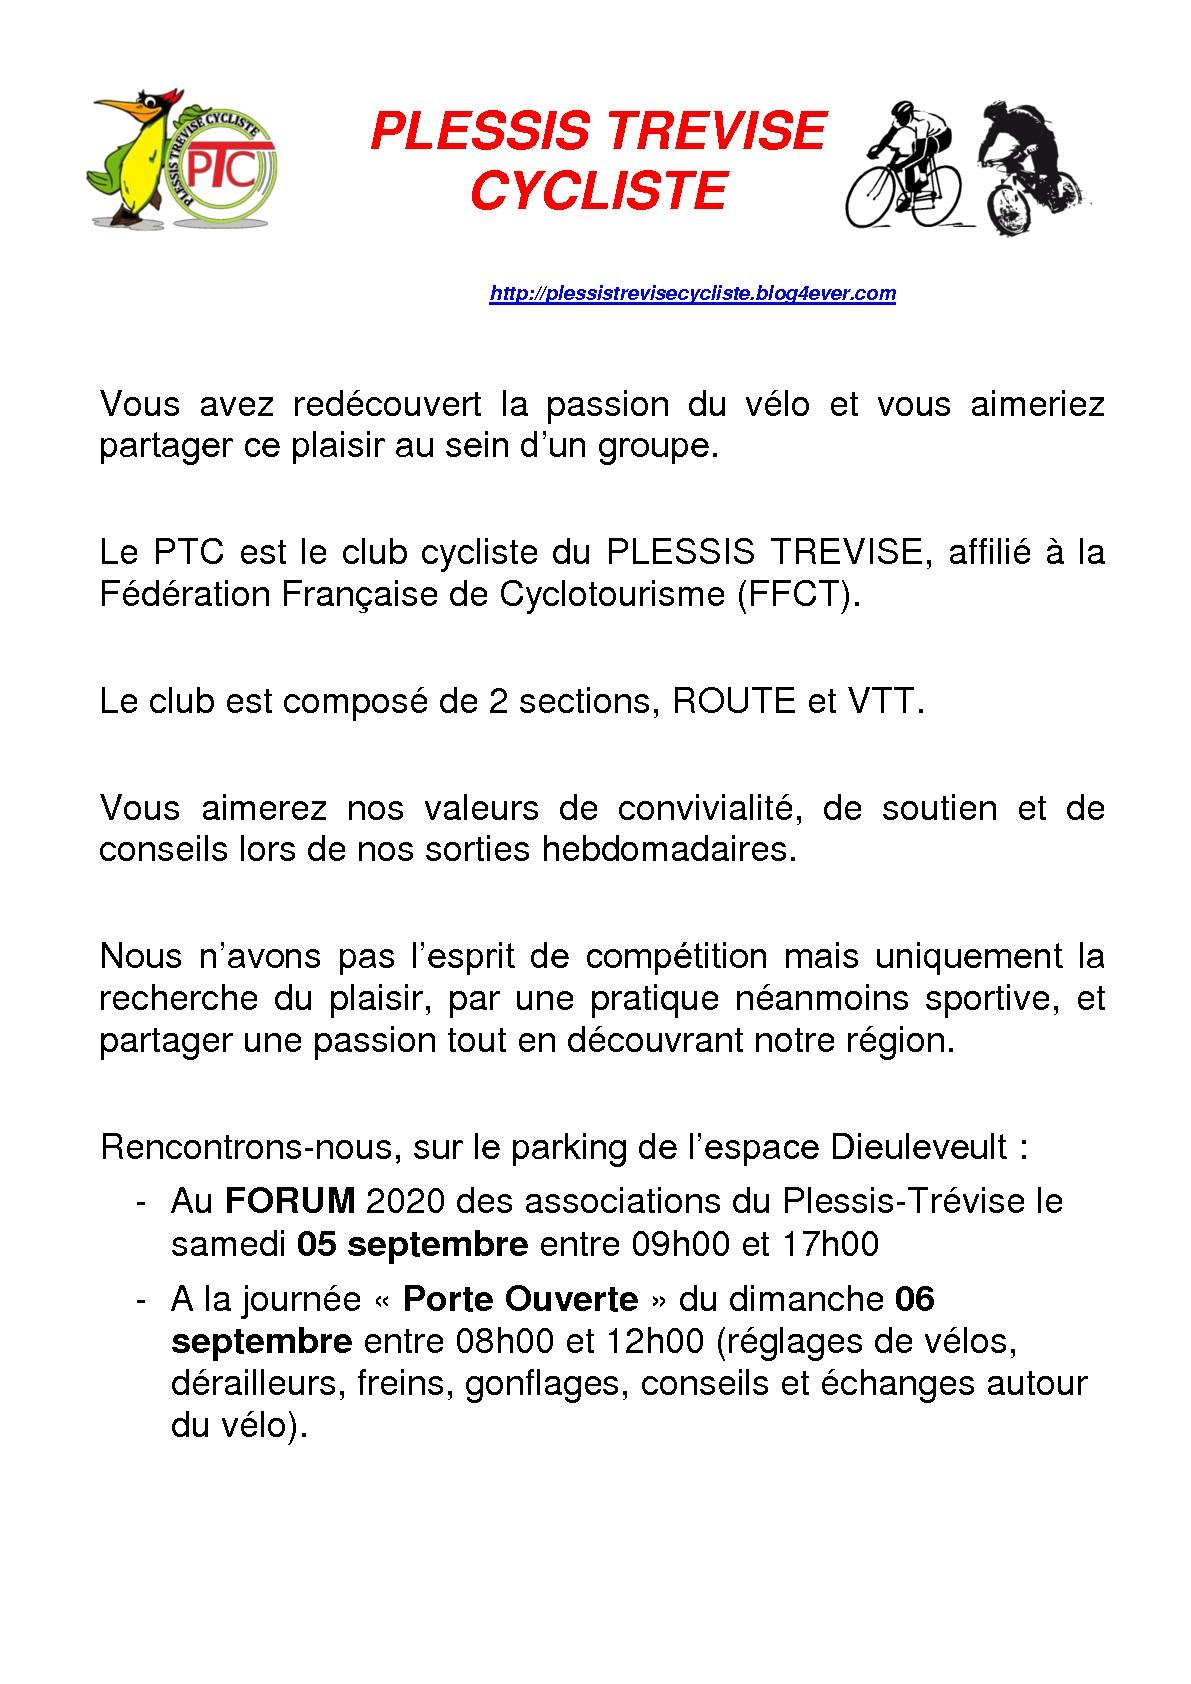 https://static.blog4ever.com/2006/03/133965/facebook-forum-2020-Gilles-001-001.jpg